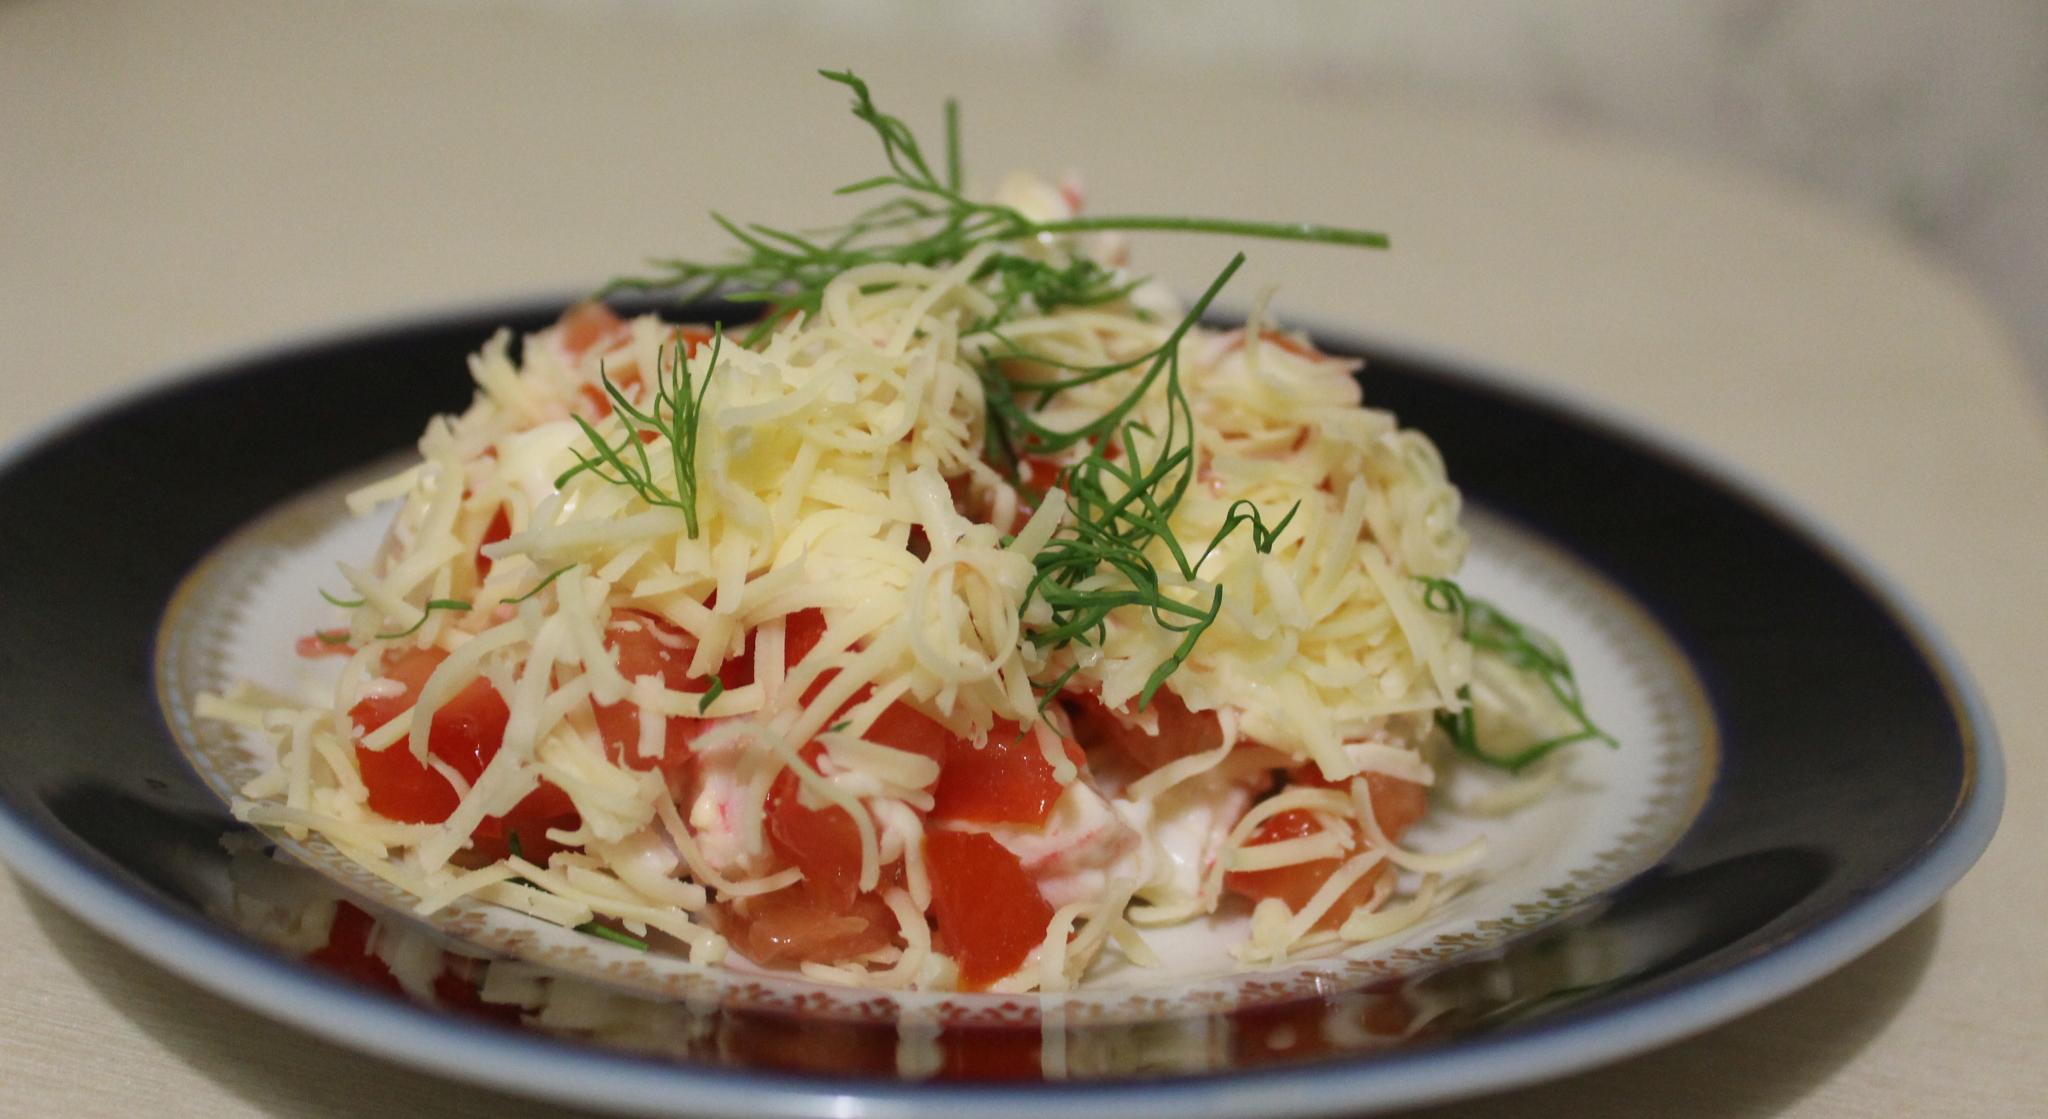 Салат со свежими овощами и крабовыми палочками